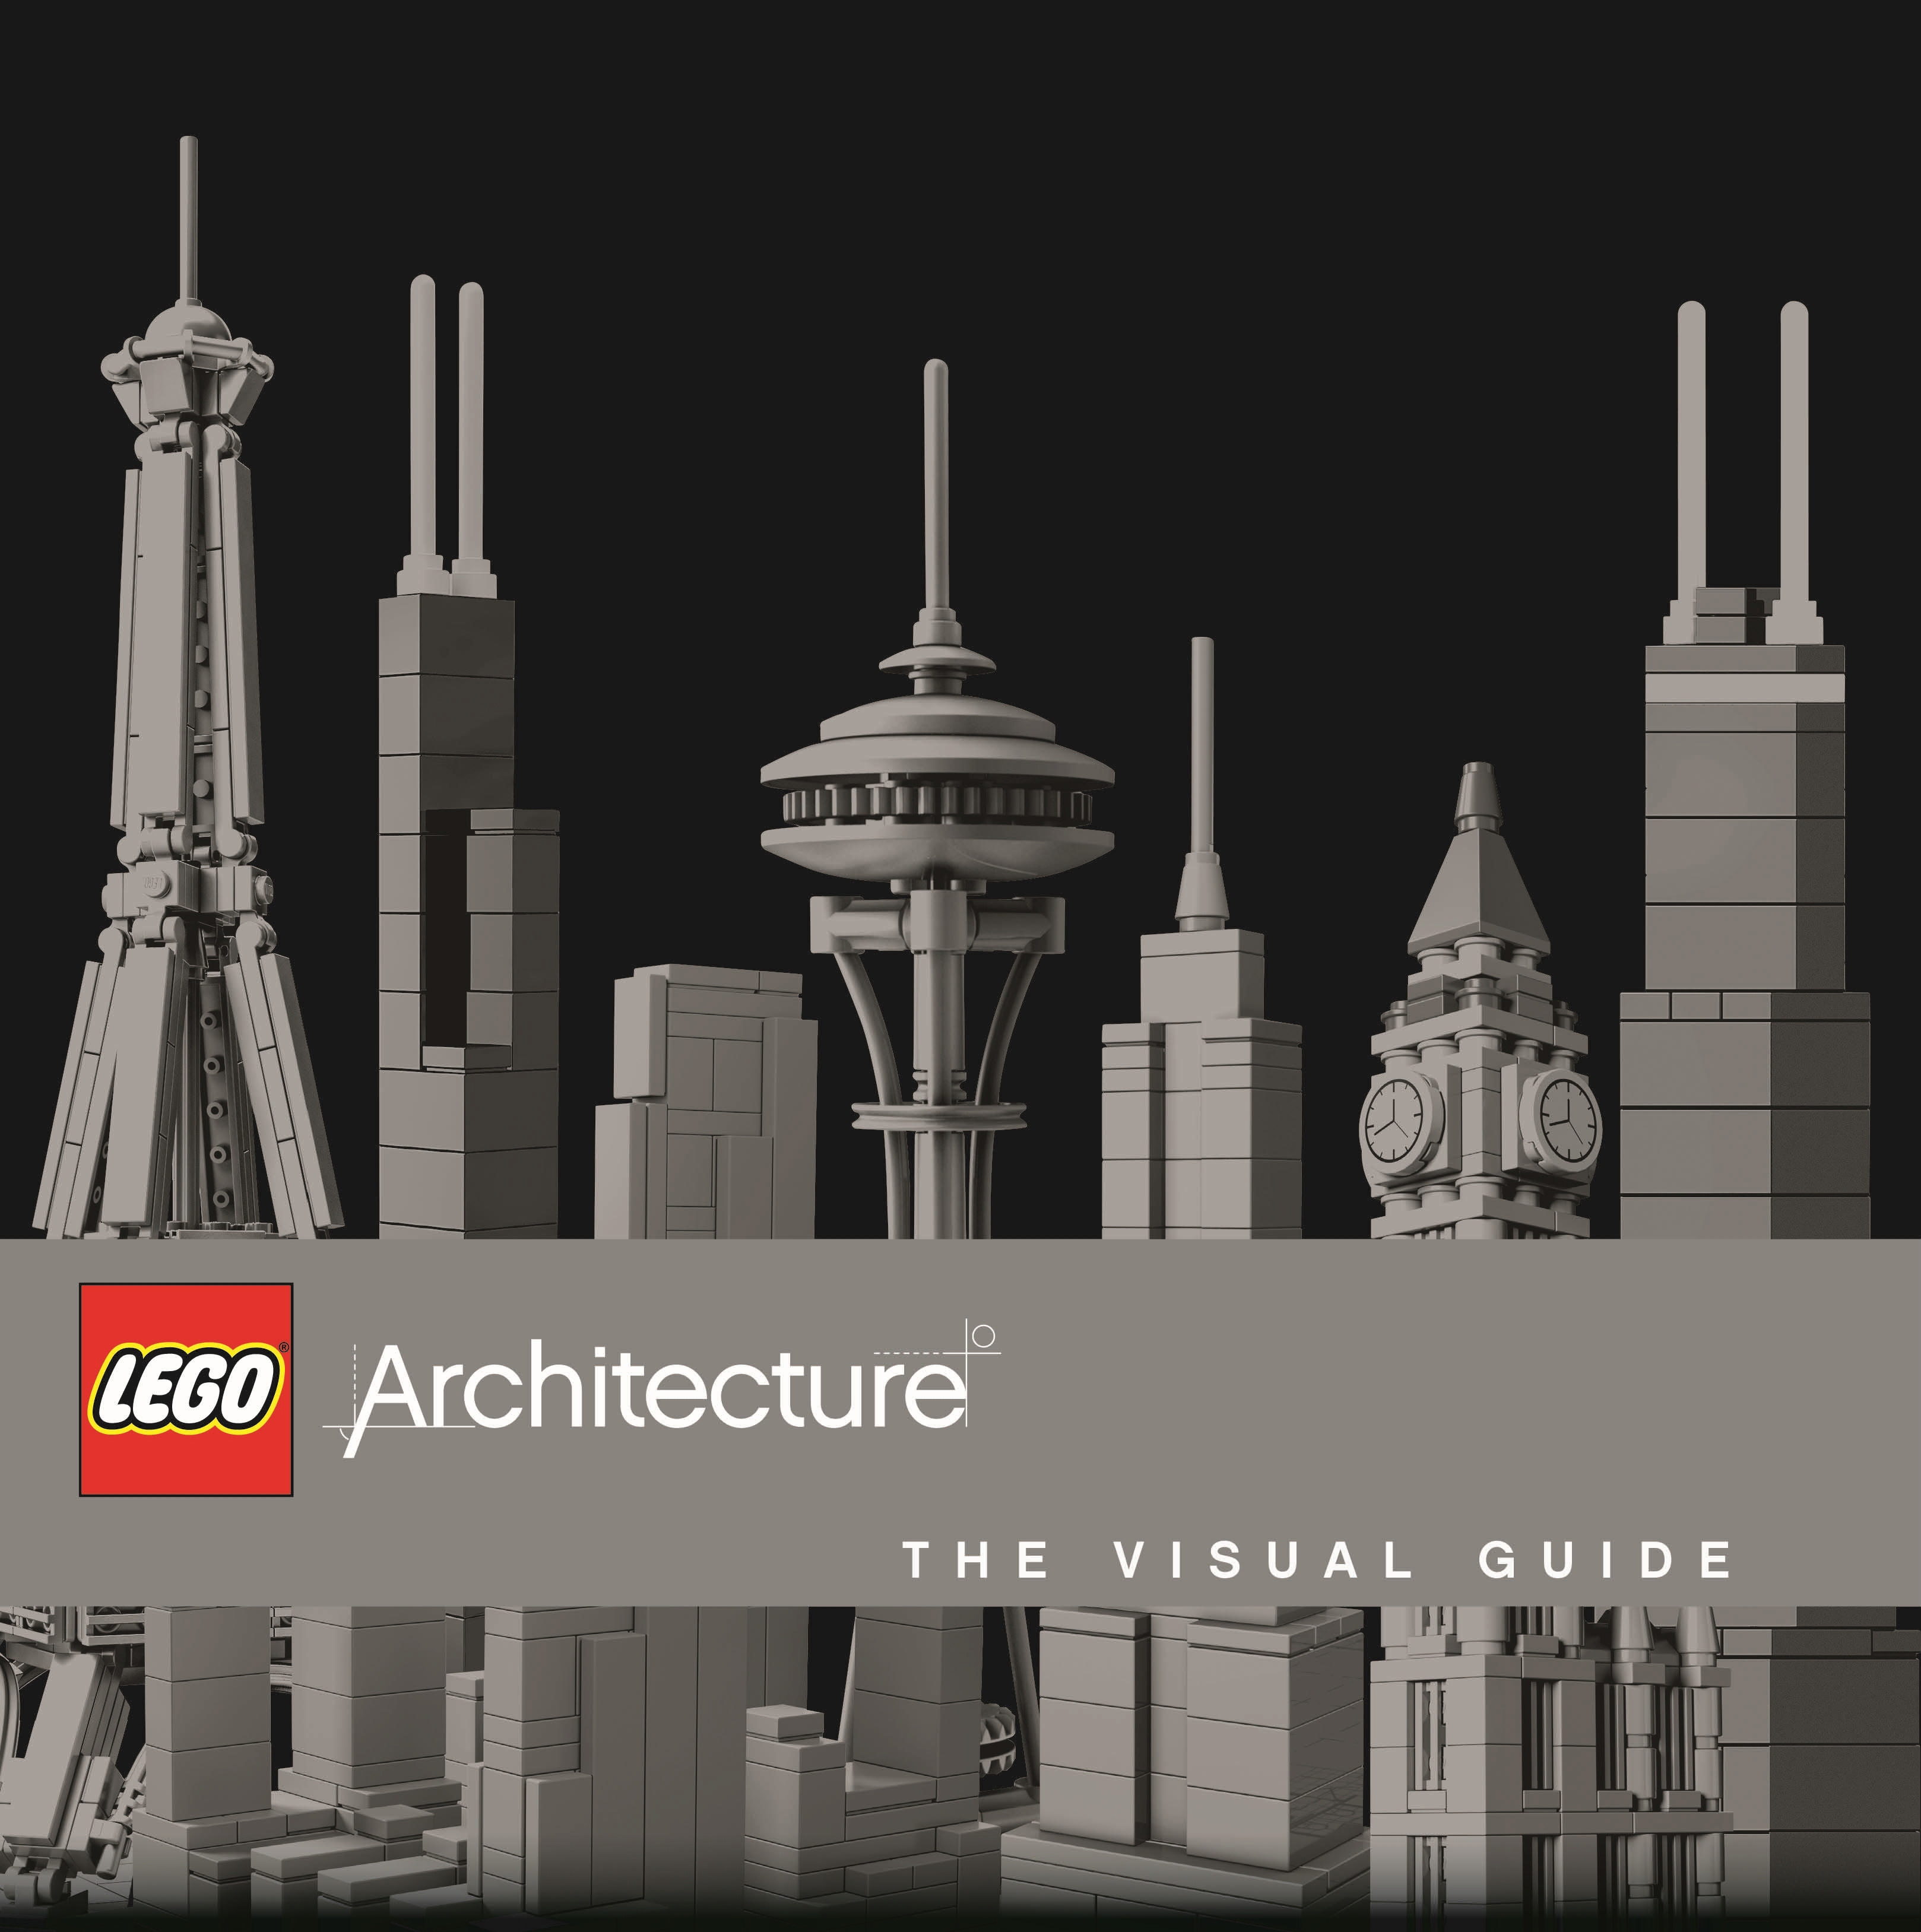 Lego_Bookcover